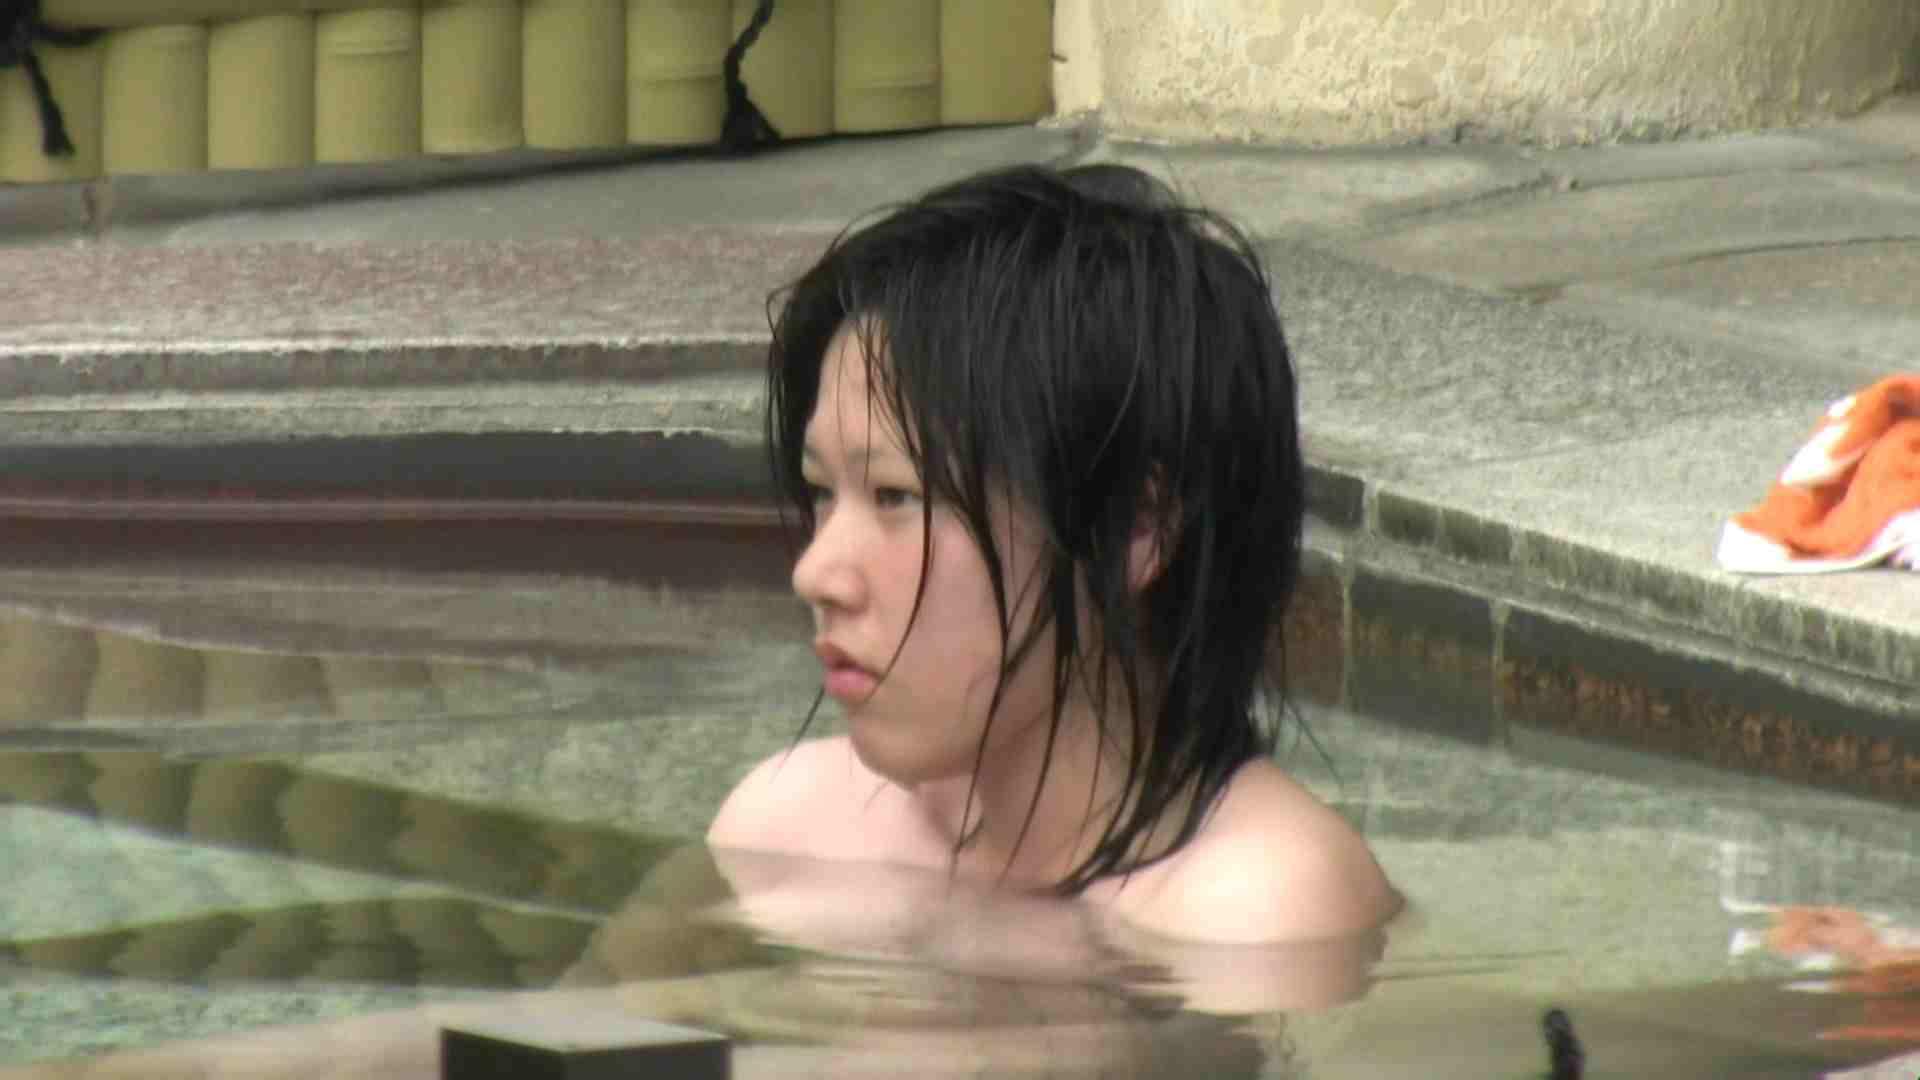 Aquaな露天風呂Vol.36 露天 のぞき動画画像 78連発 47